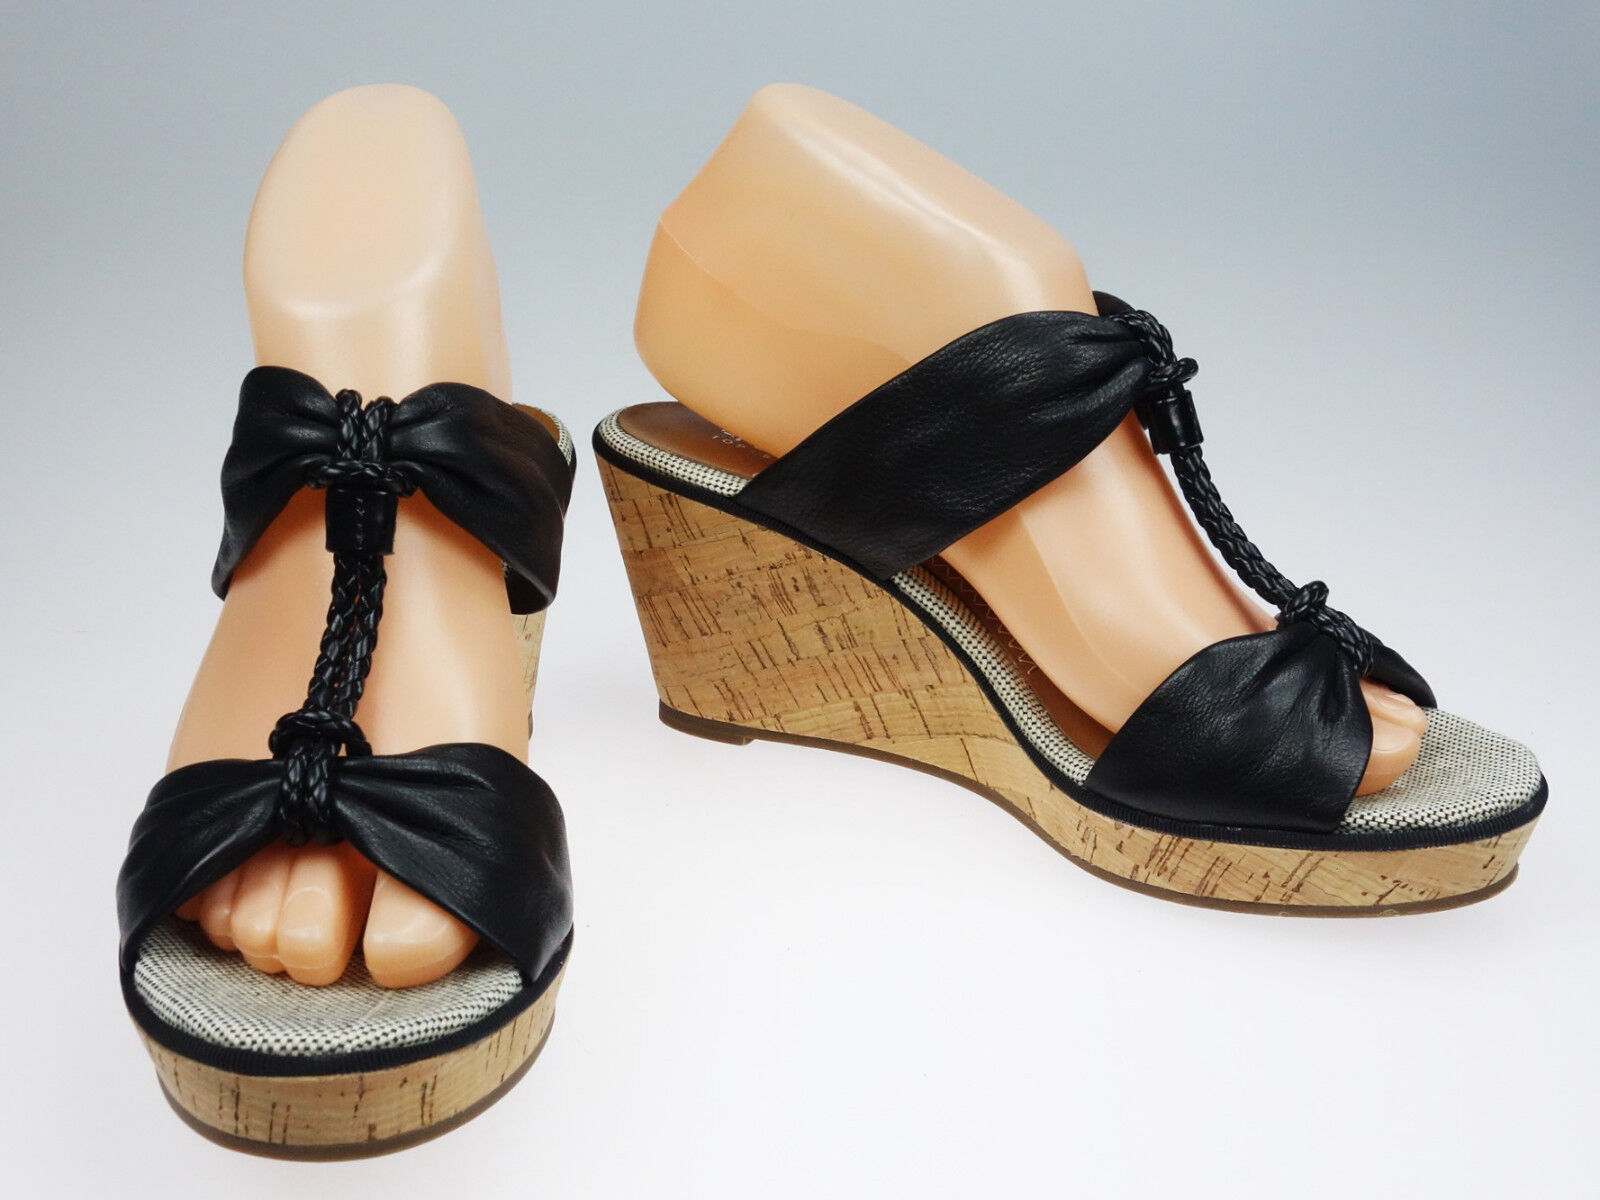 7.5M Sperry Top Sider Shoreham Black Leather Cork Wedge Sandal